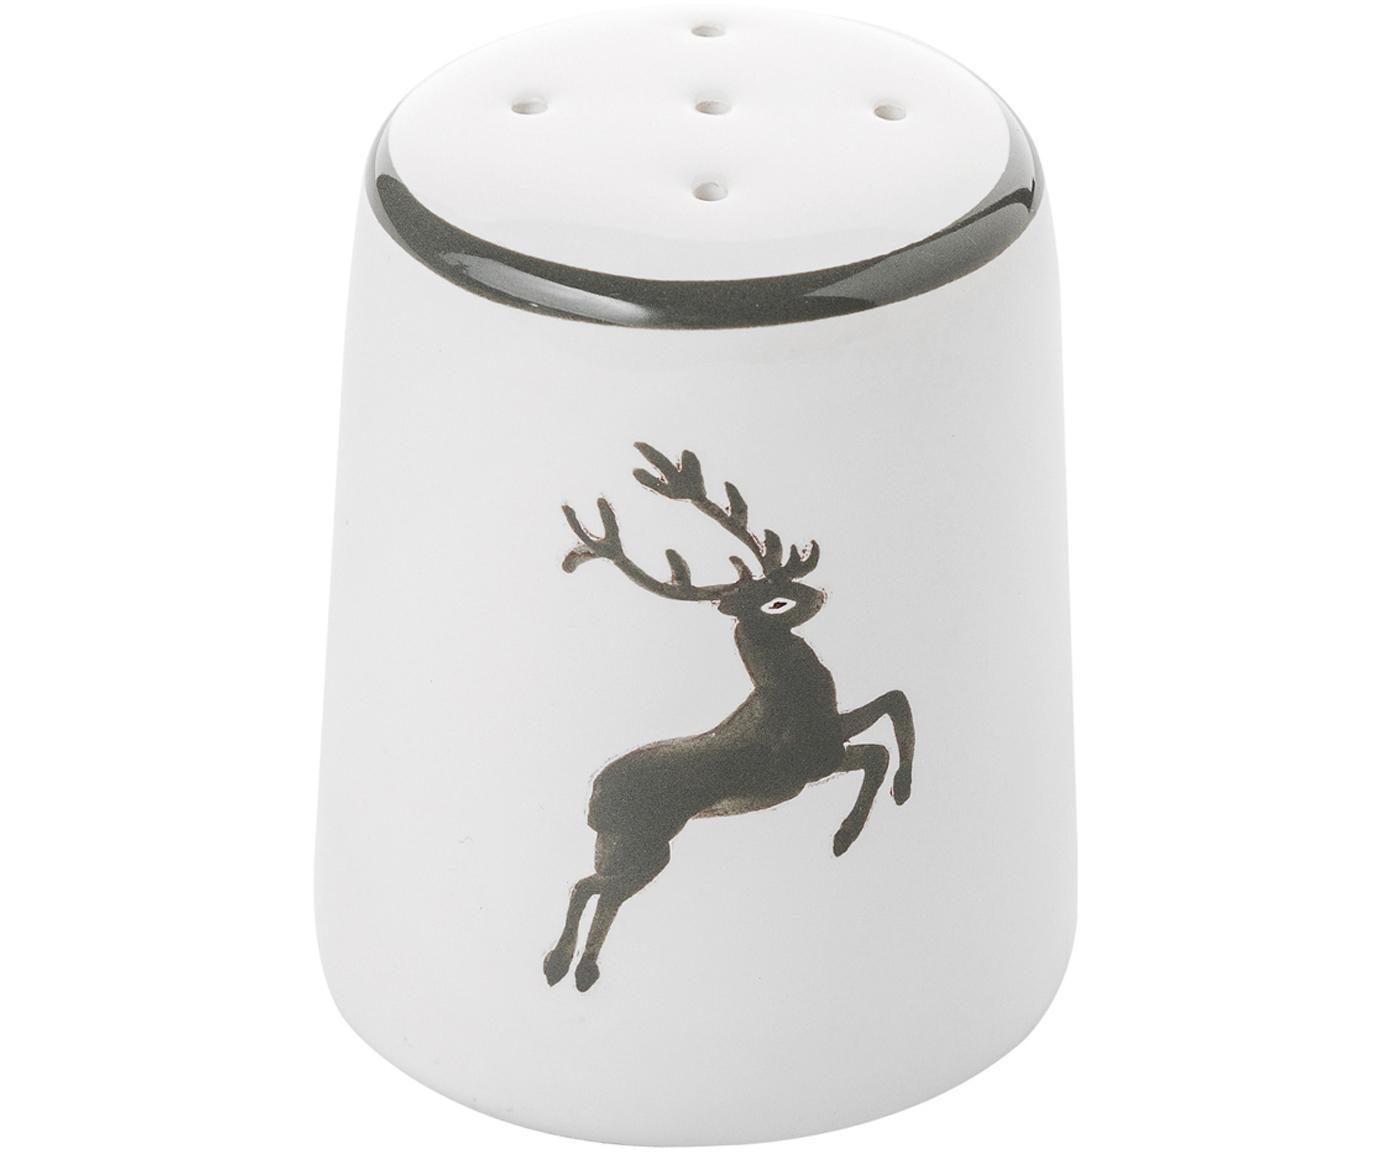 Handgefertigter Salzstreuer Classic Grauer Hirsch, Keramik, Grau,Weiß, H 4 cm